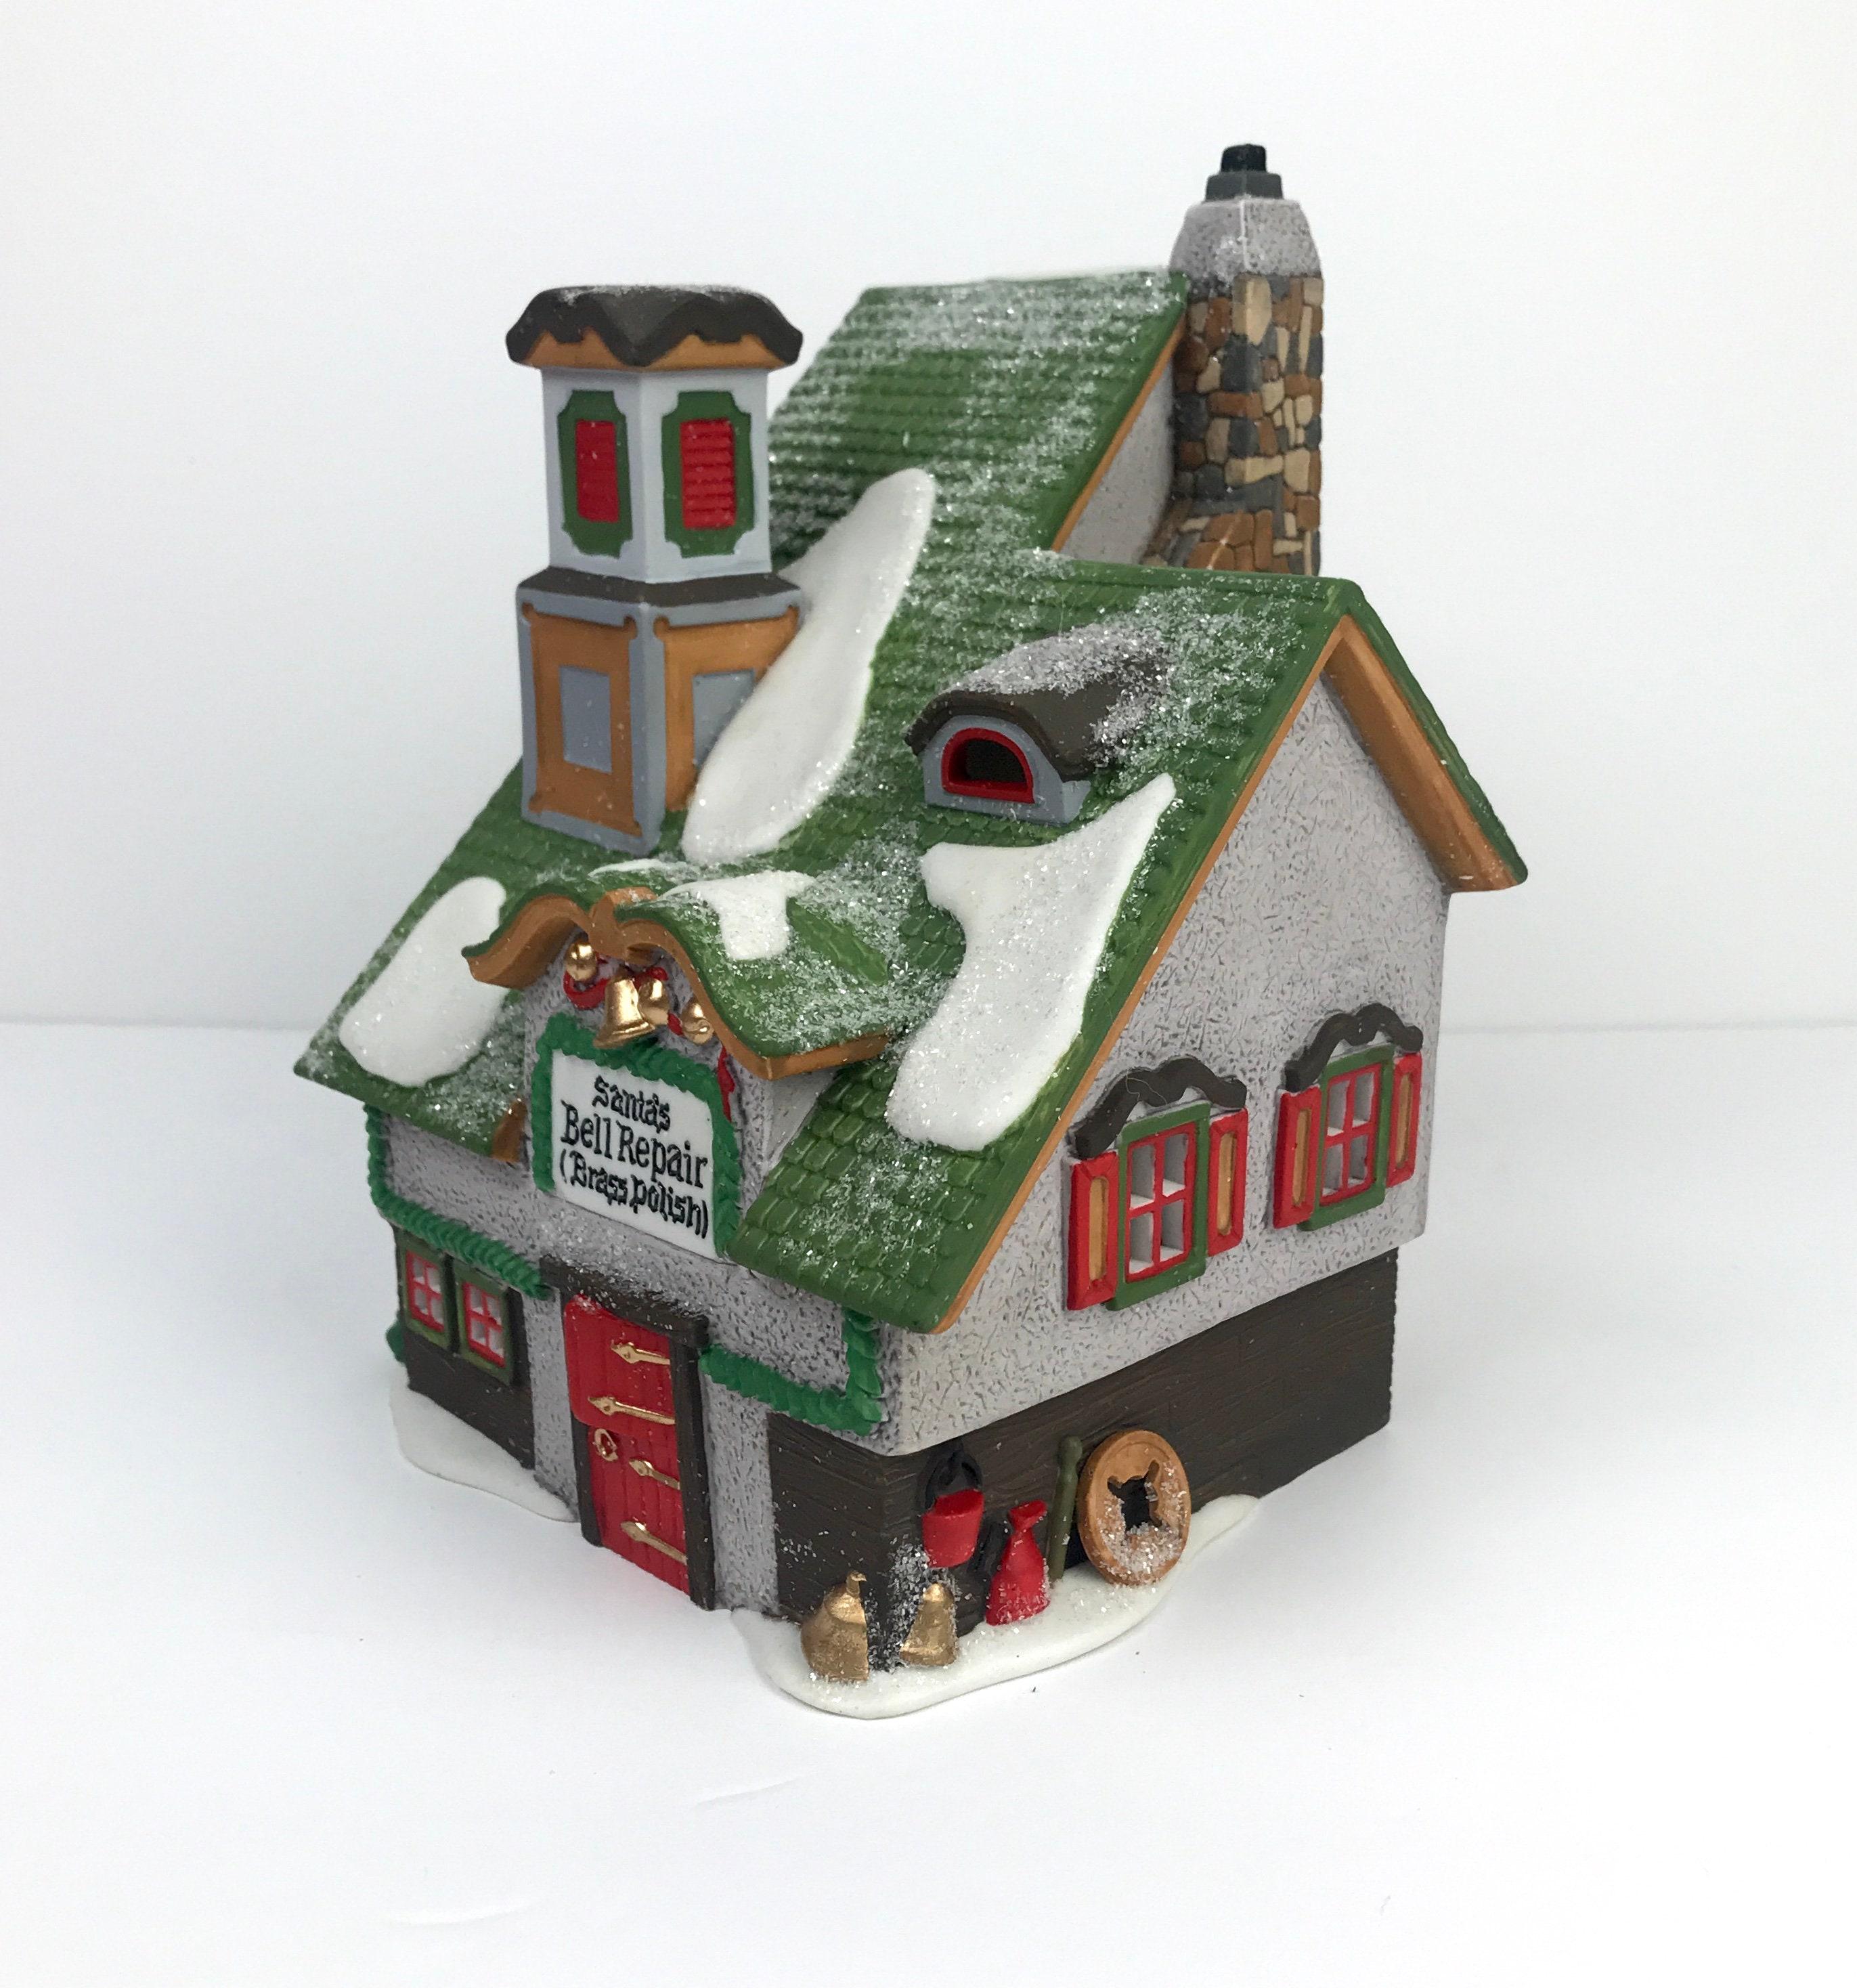 Santa's Bell Repair Christmas Village Shop from Dept. 56 ...